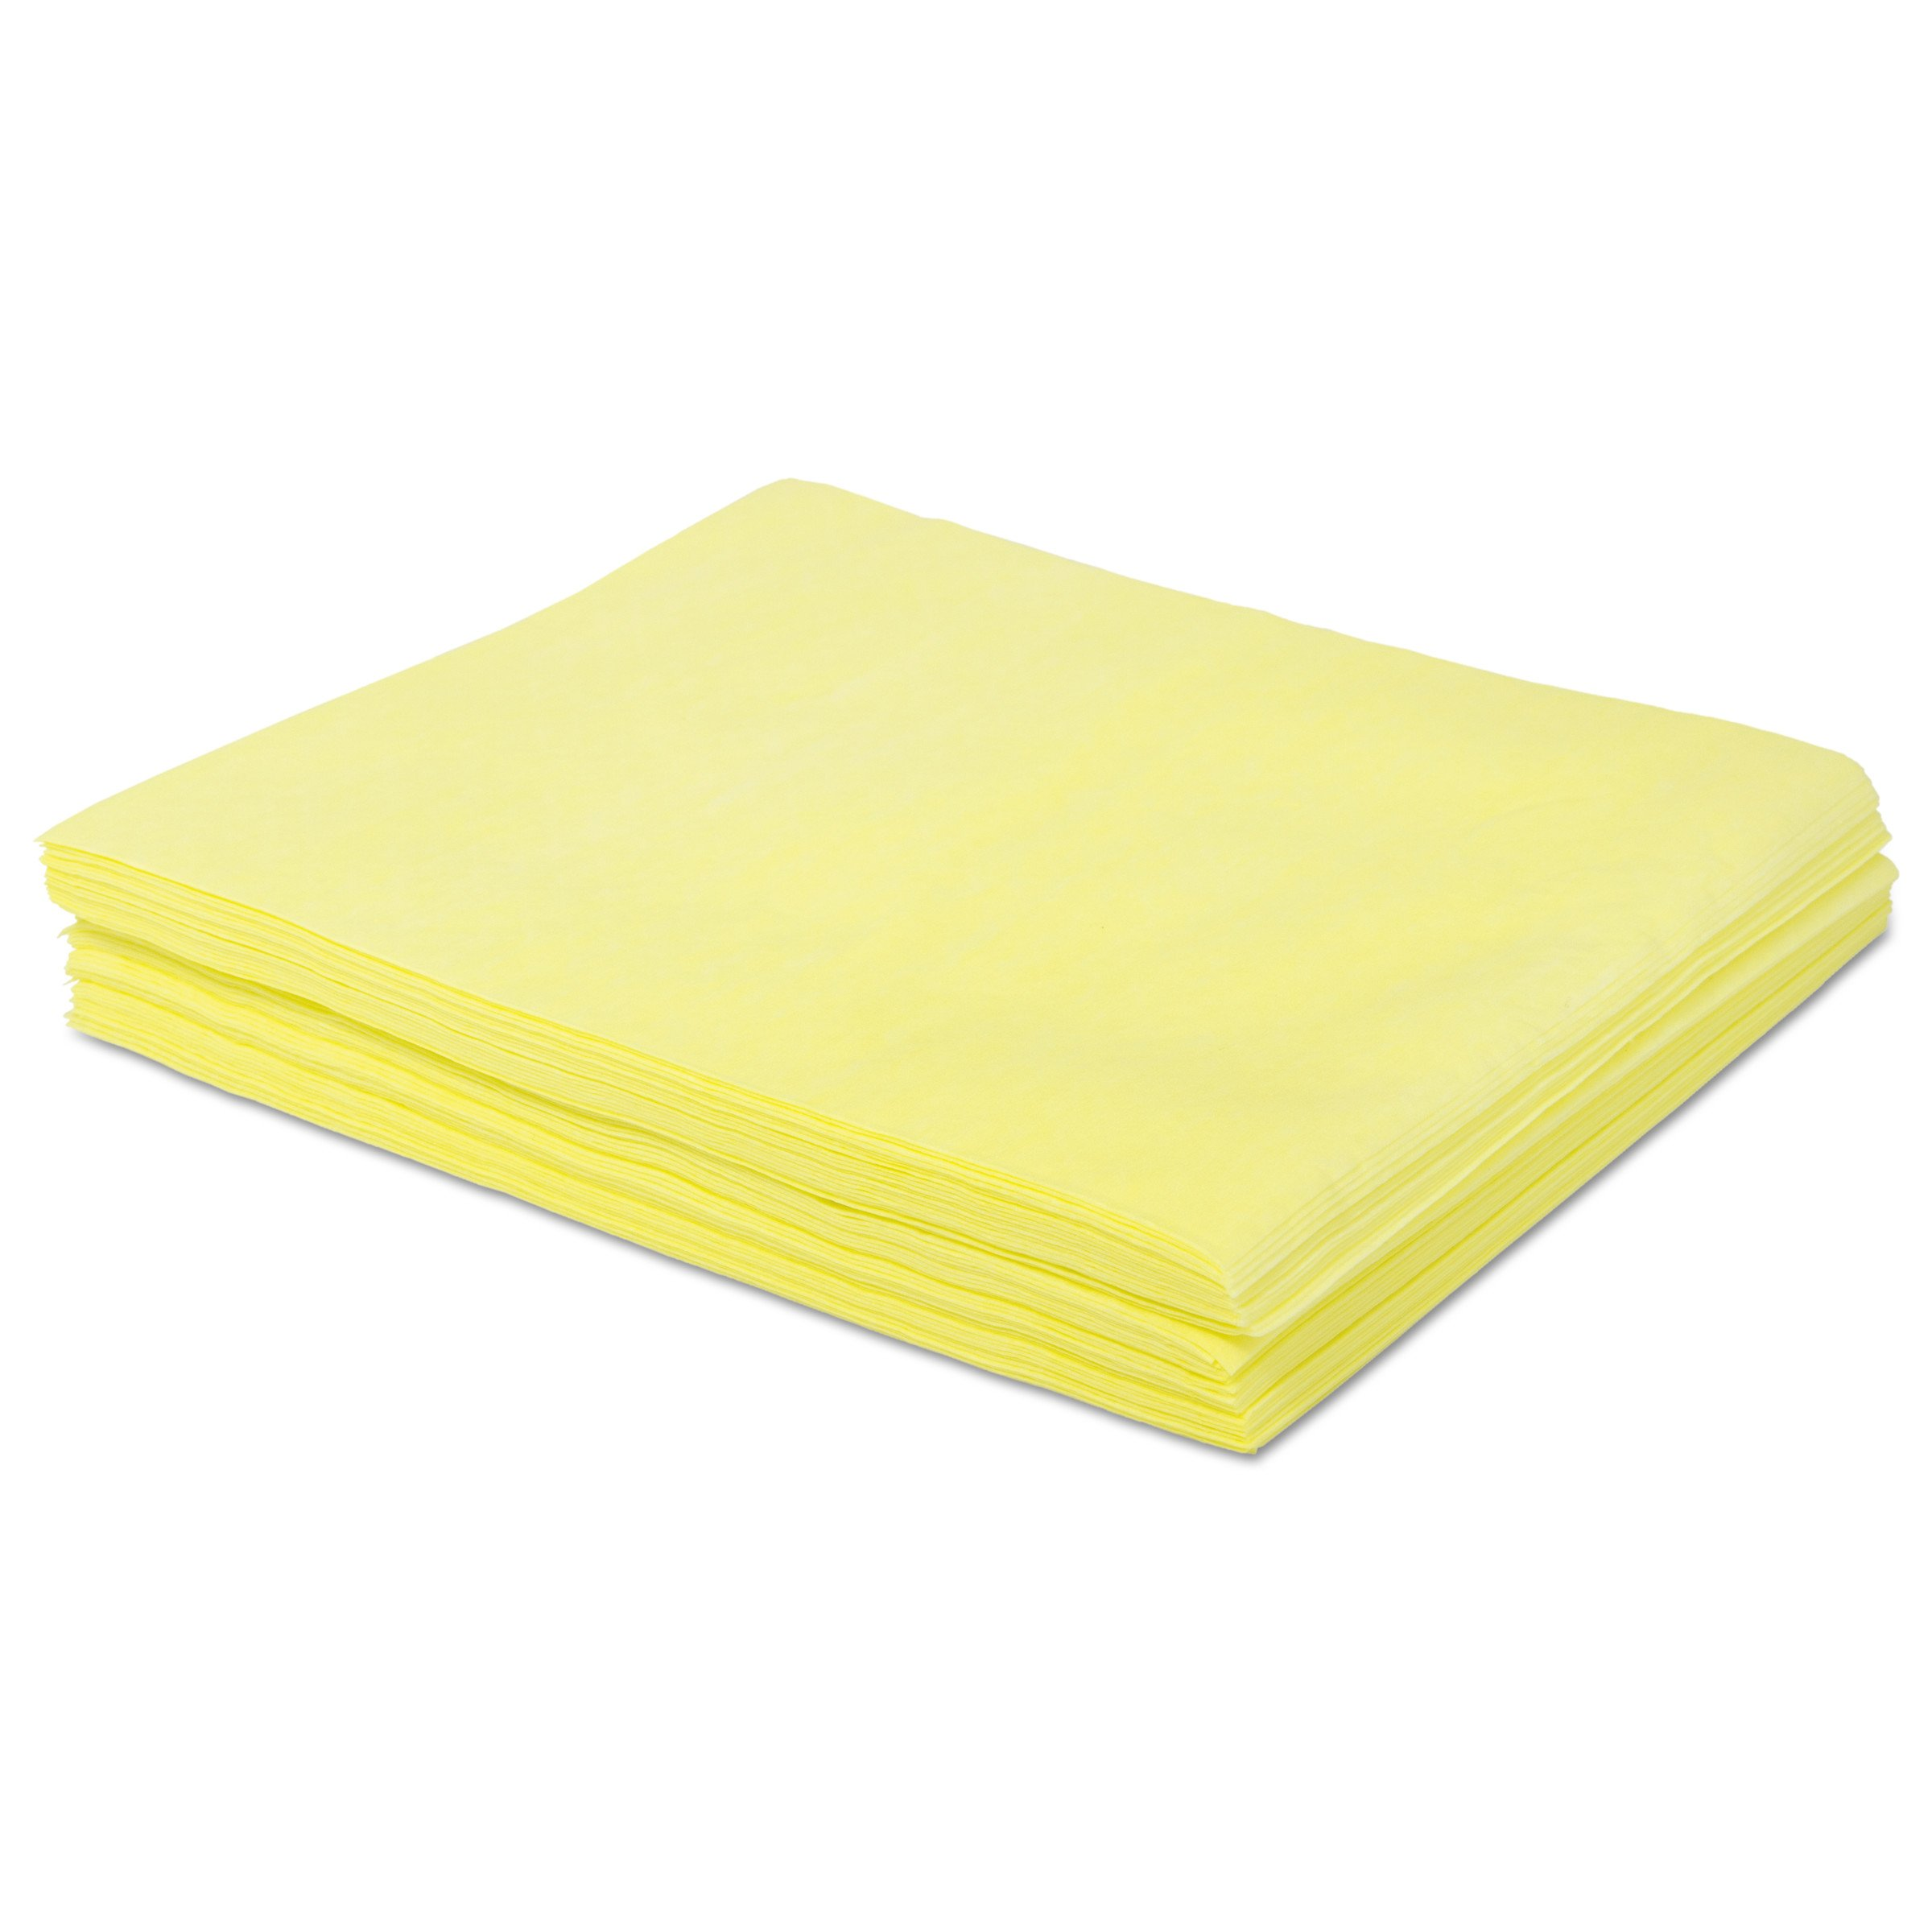 Boardwalk BWKDSMFPY Dust Cloths, 18'' x 24'', Yellow (Case of 500)